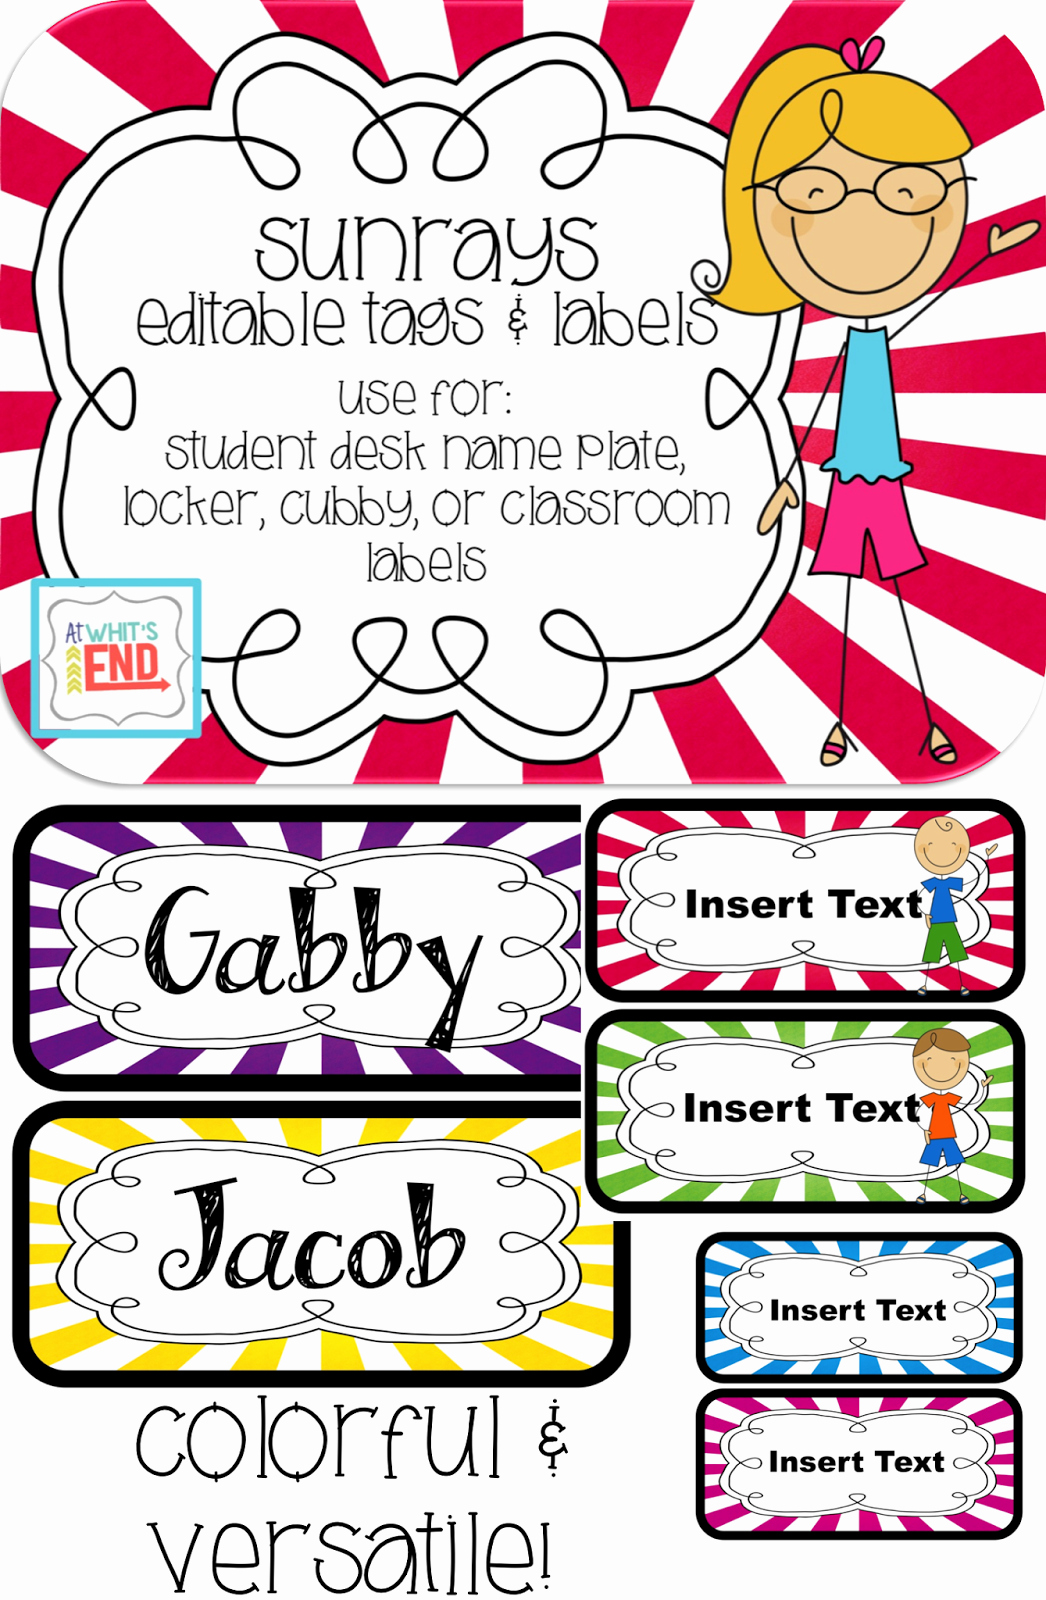 Student Desk Name Plates Templates Beautiful Student Desk Name Tags Hostgarcia